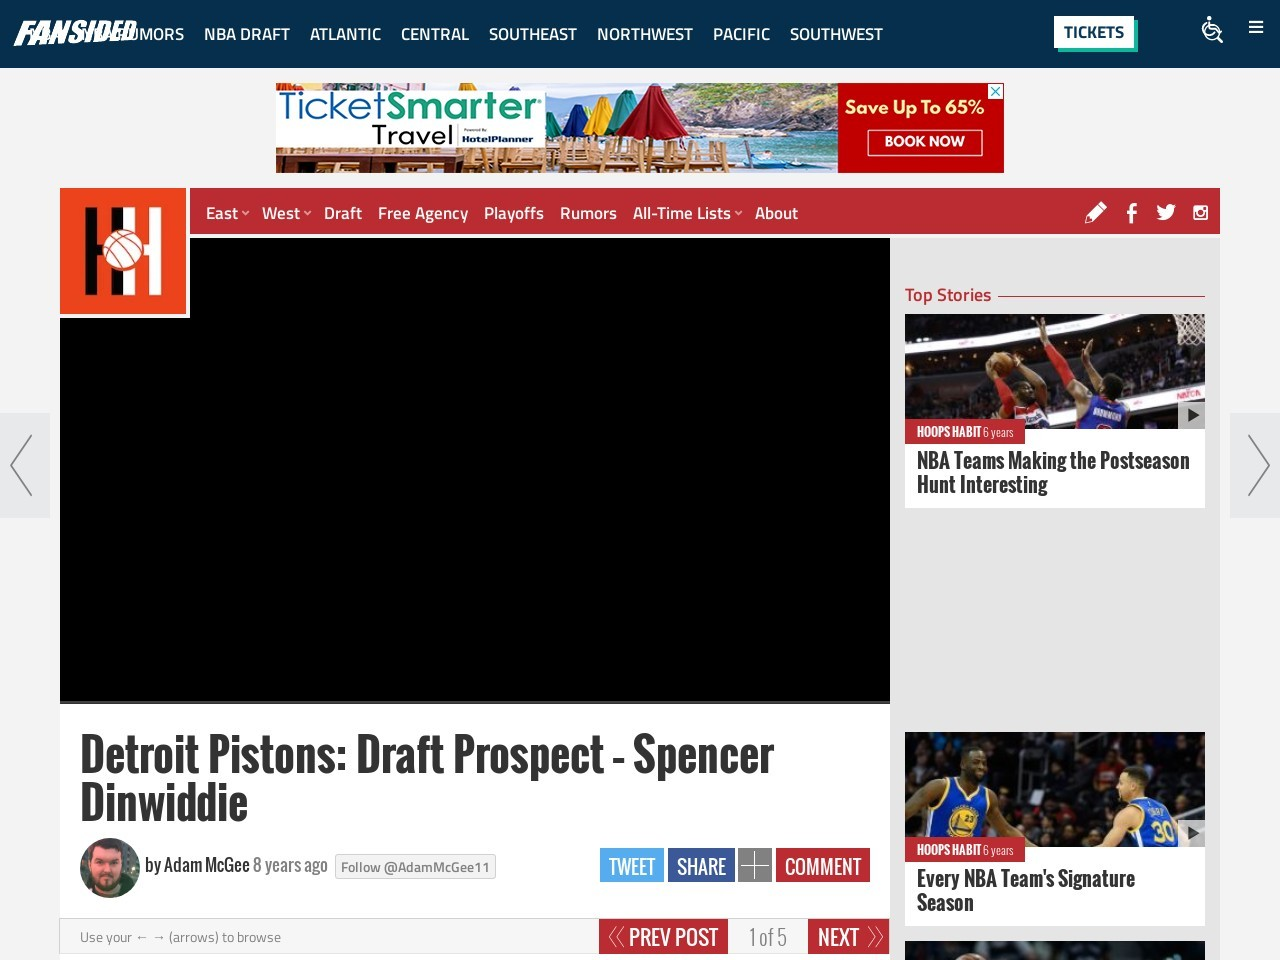 Detroit Pistons: Draft Prospect – Spencer Dinwiddie